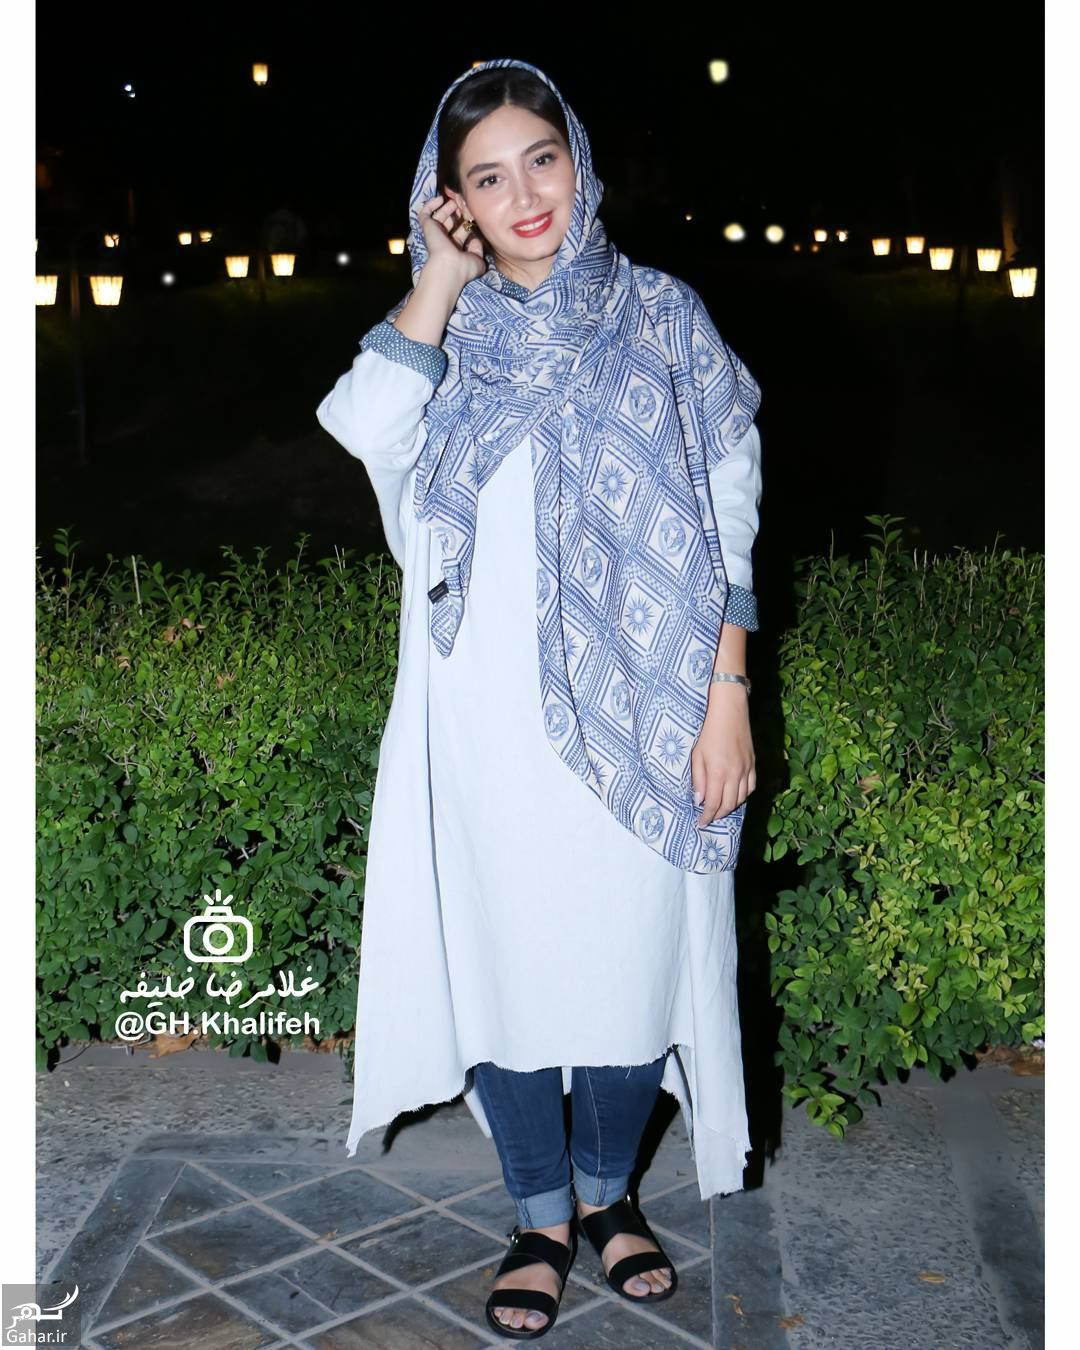 922143 Gahar ir عکس های جدید دیبا زاهدی در اکران خصوصی فیلم اگزما